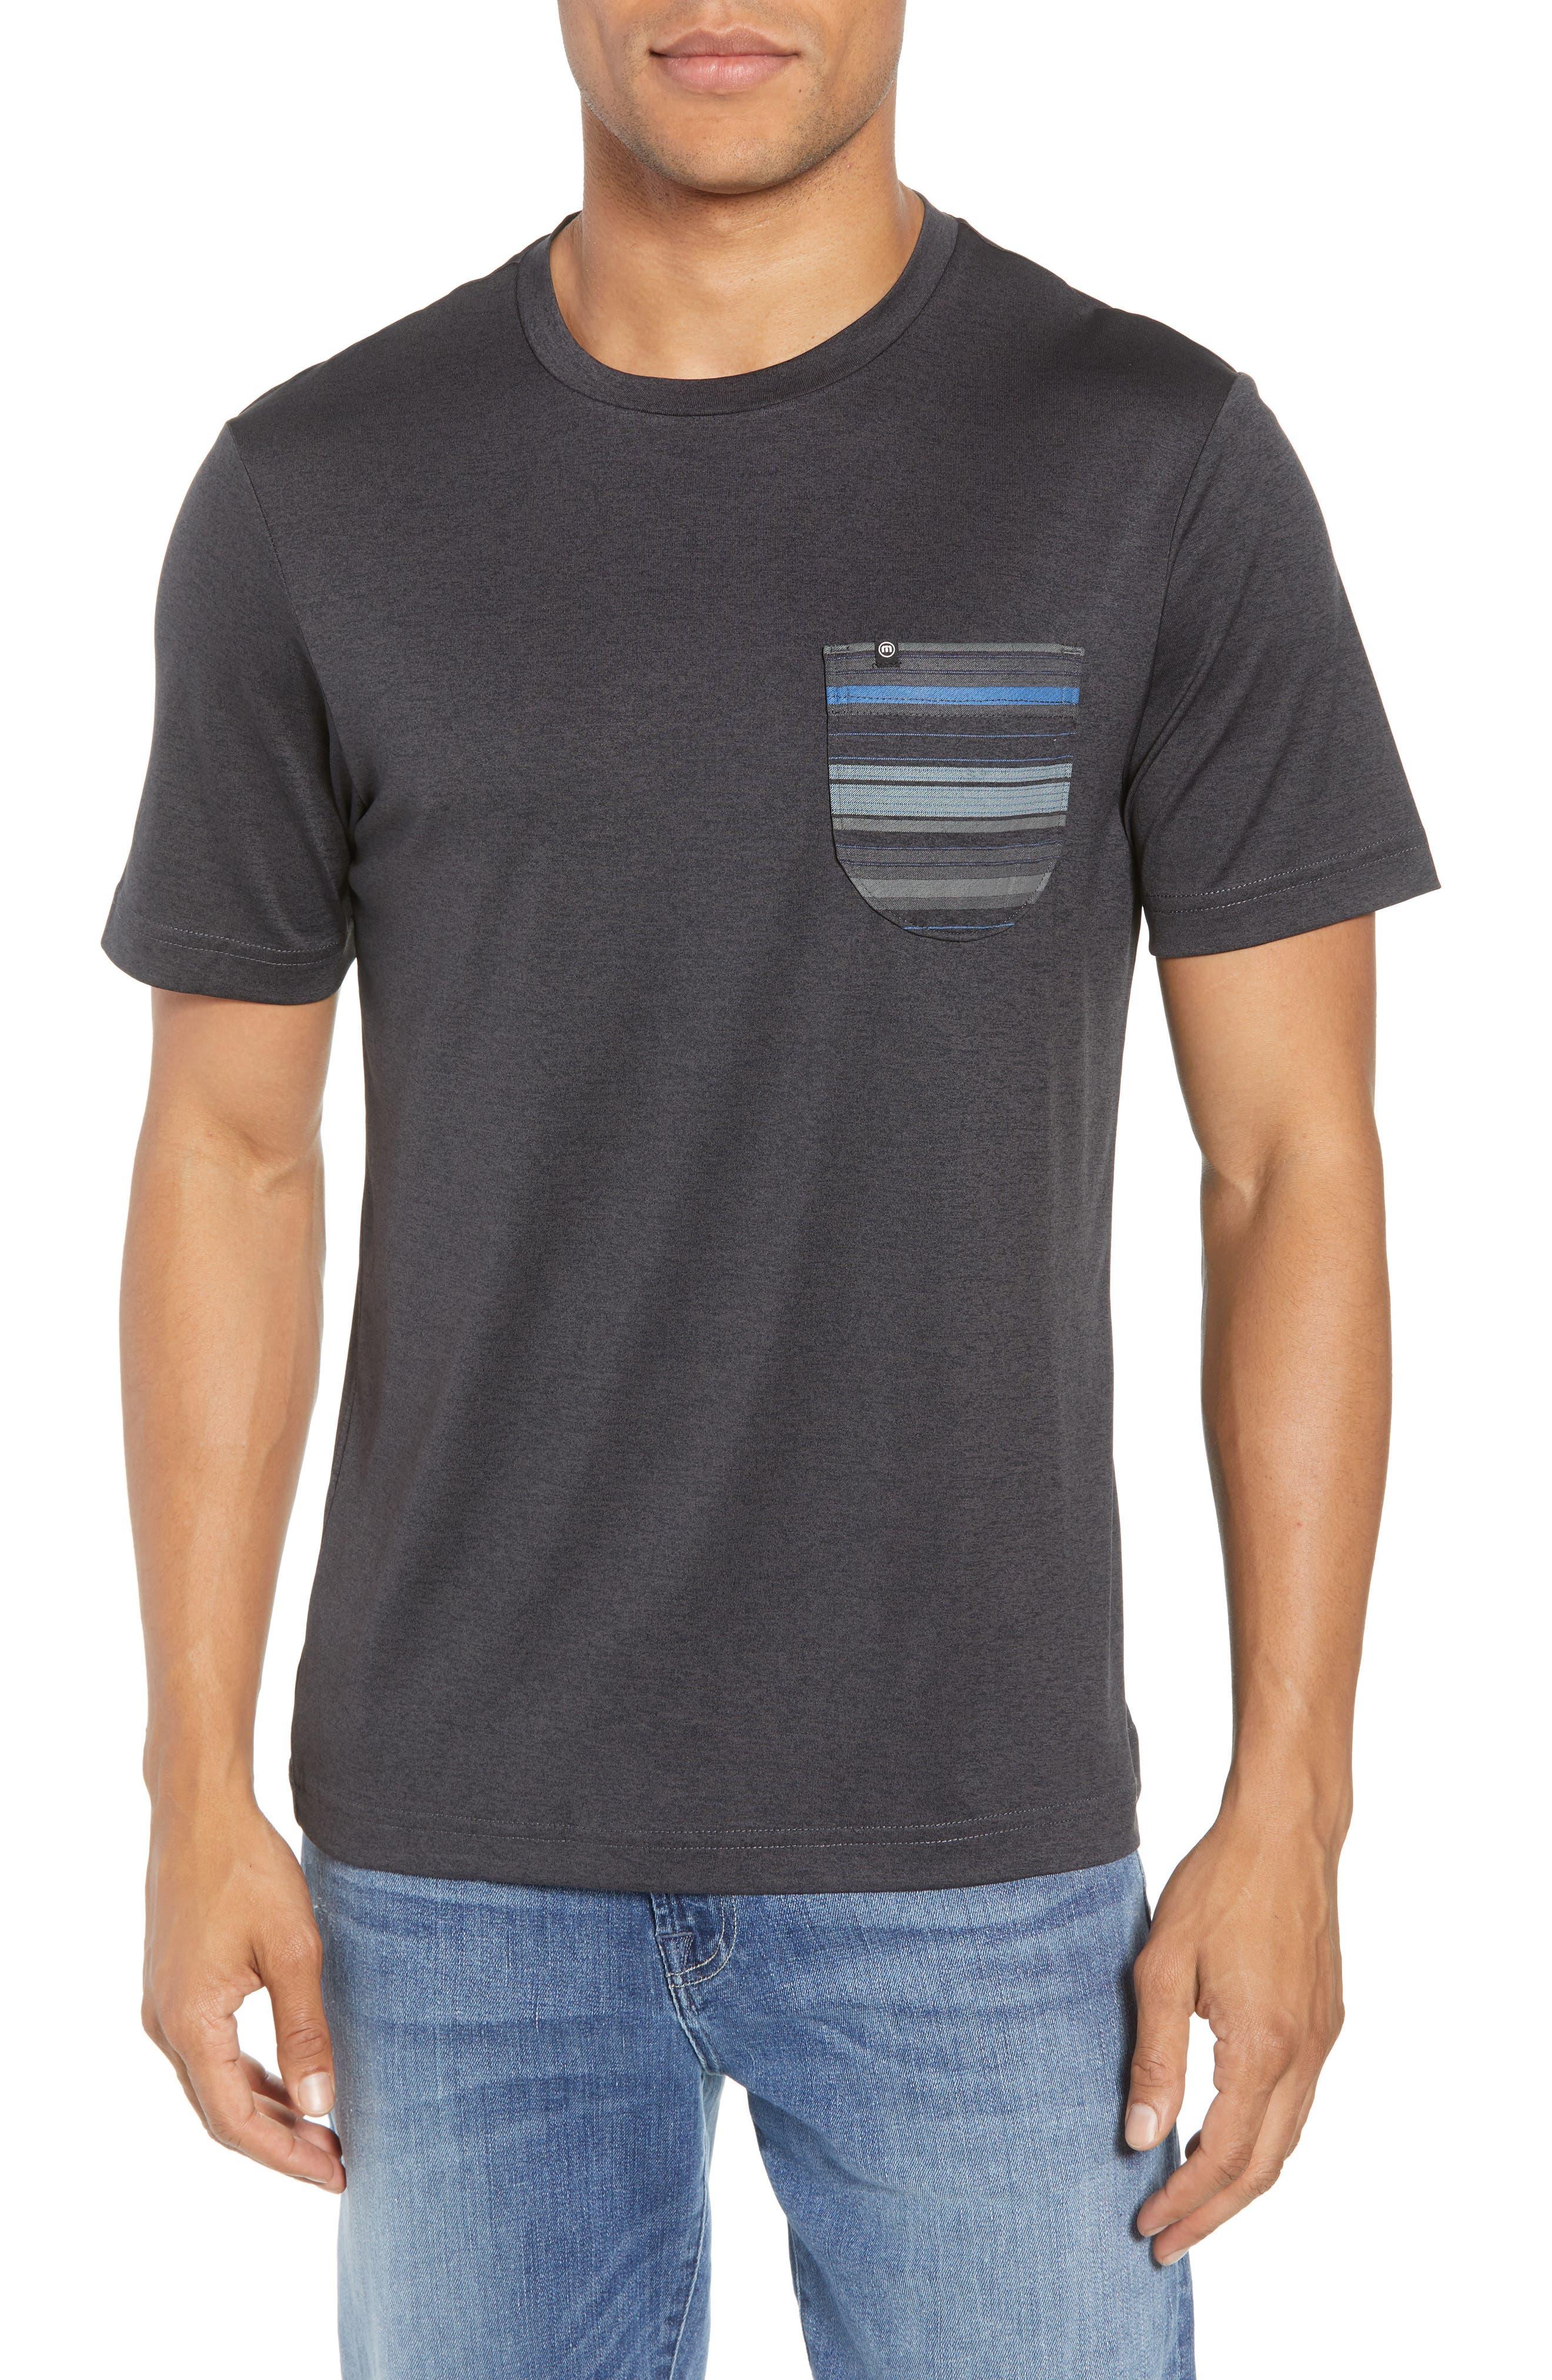 Travis Mathew Feeble Pocket Performance T-Shirt